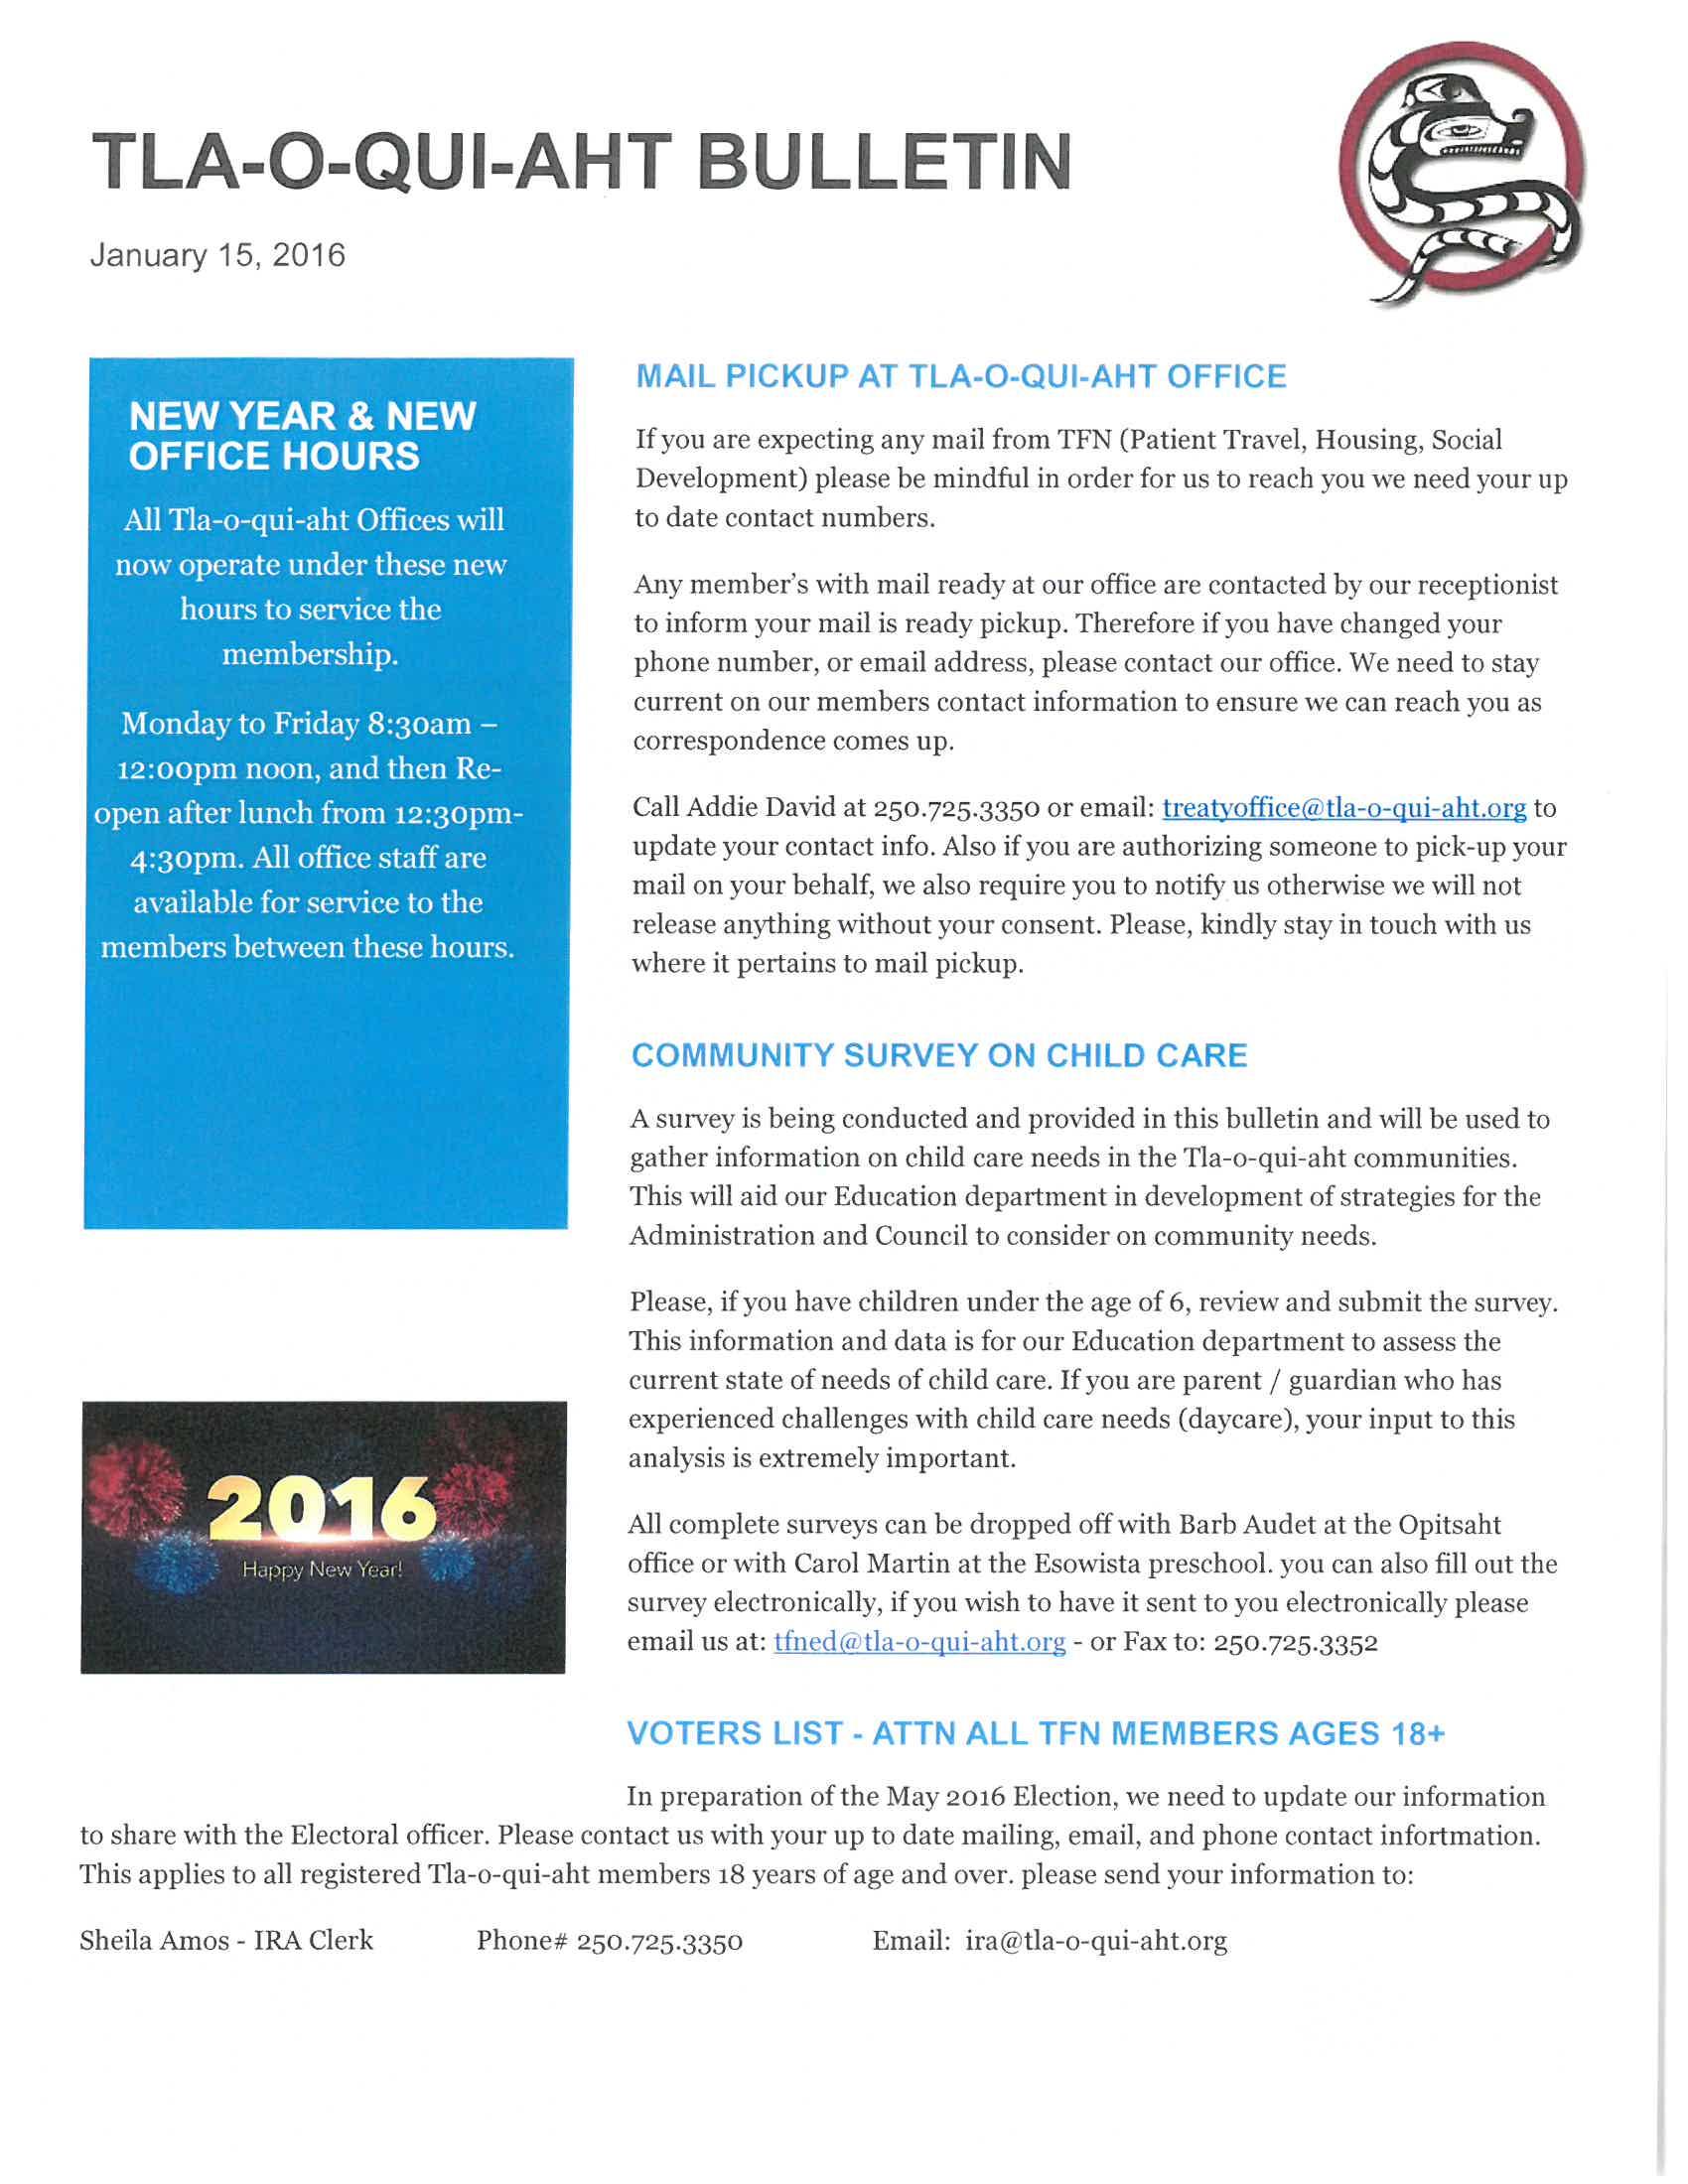 TFN Bulletin Jan 15-2016_Page_01.jpg